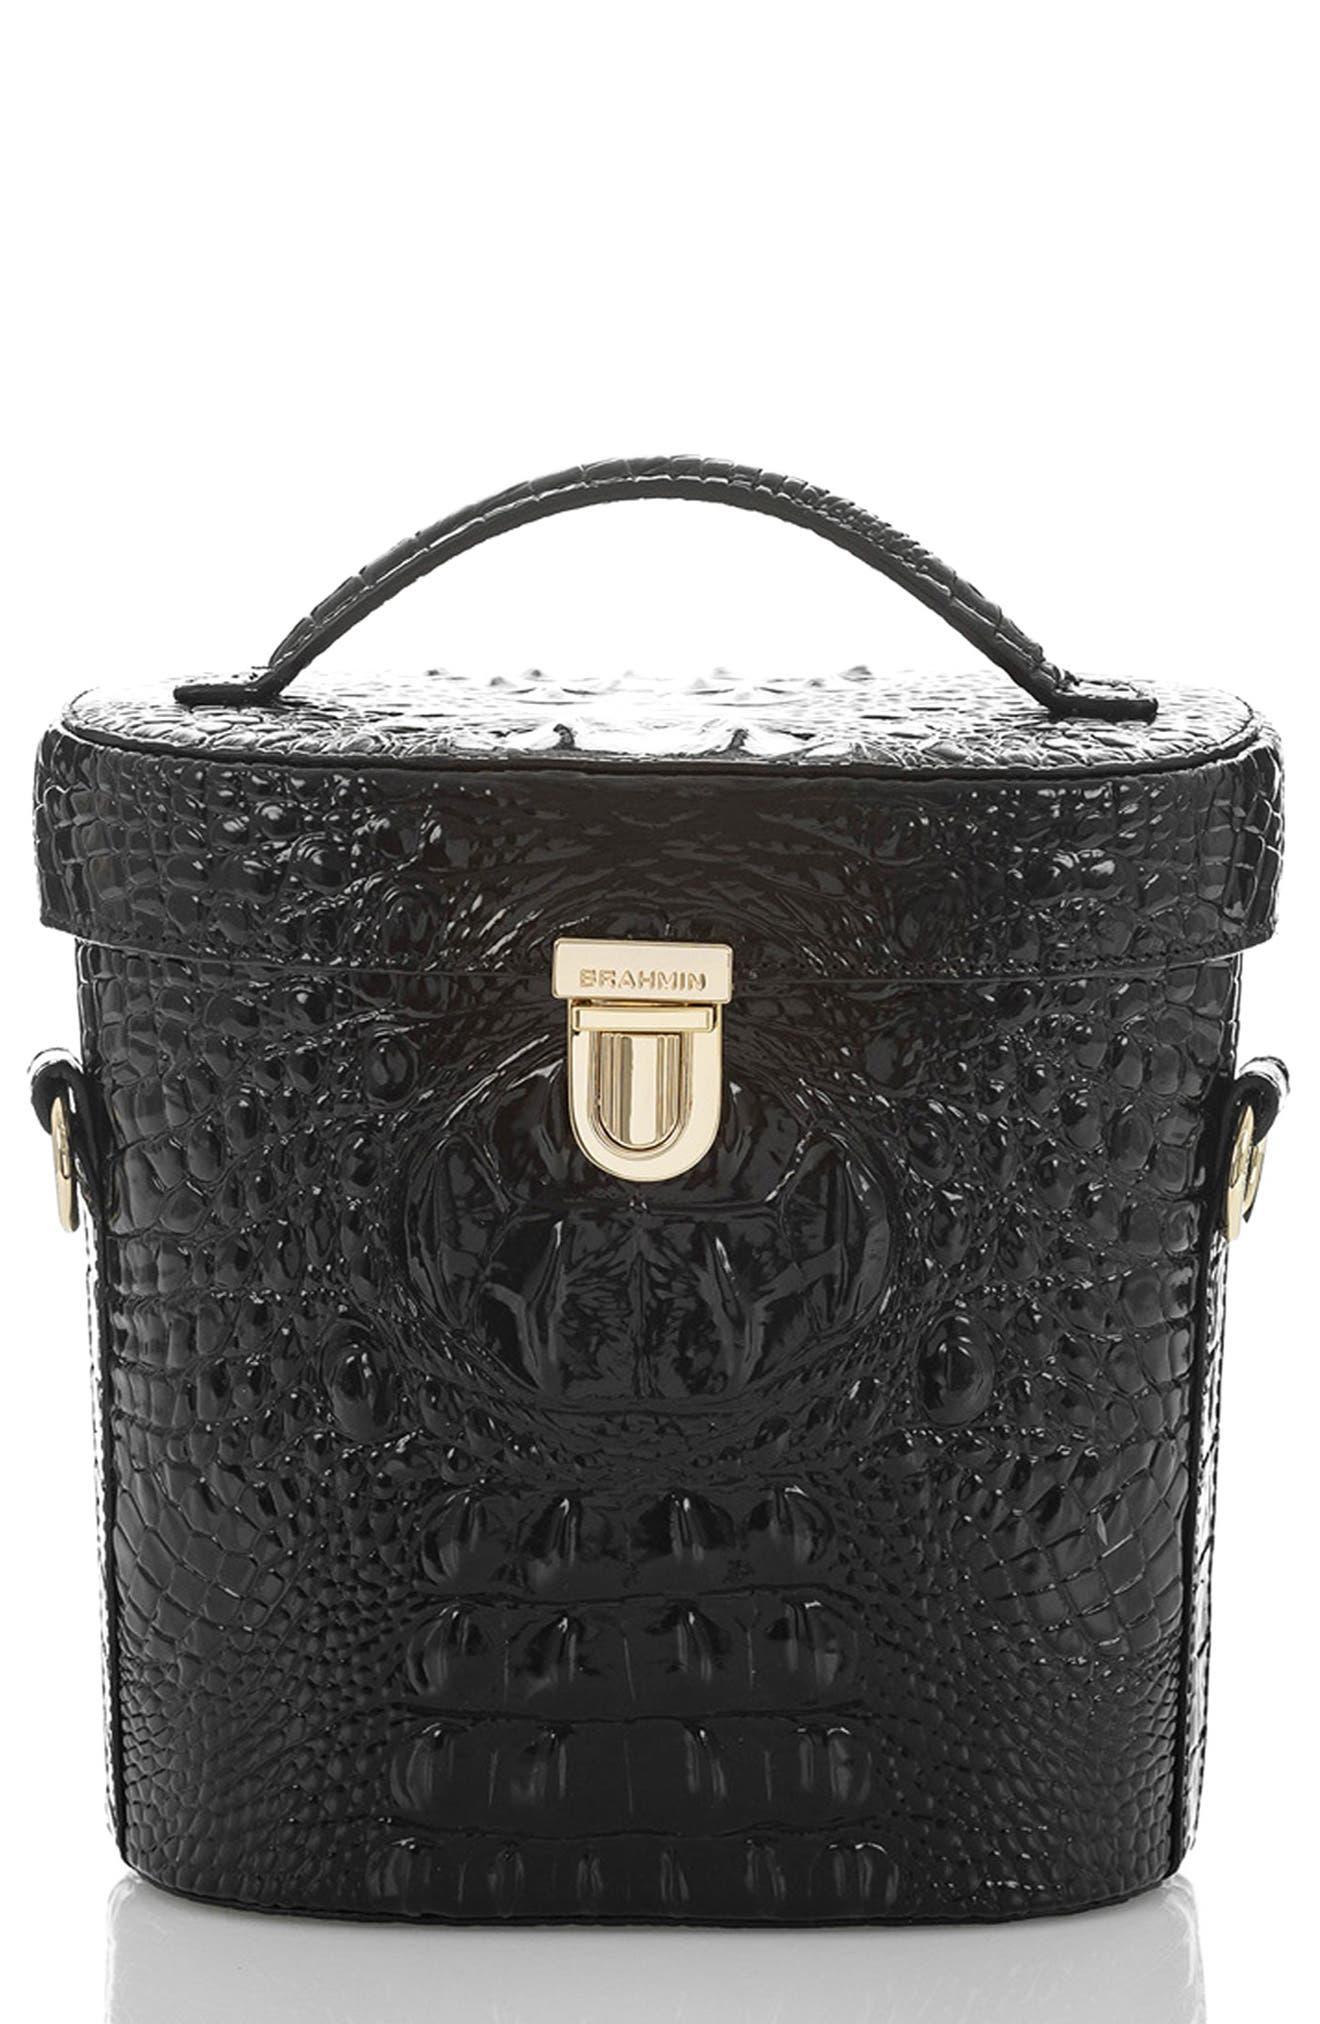 Pipp Croc Embossed Leather Top Handle Bag,                             Main thumbnail 1, color,                             BLACK MEMBOURNE